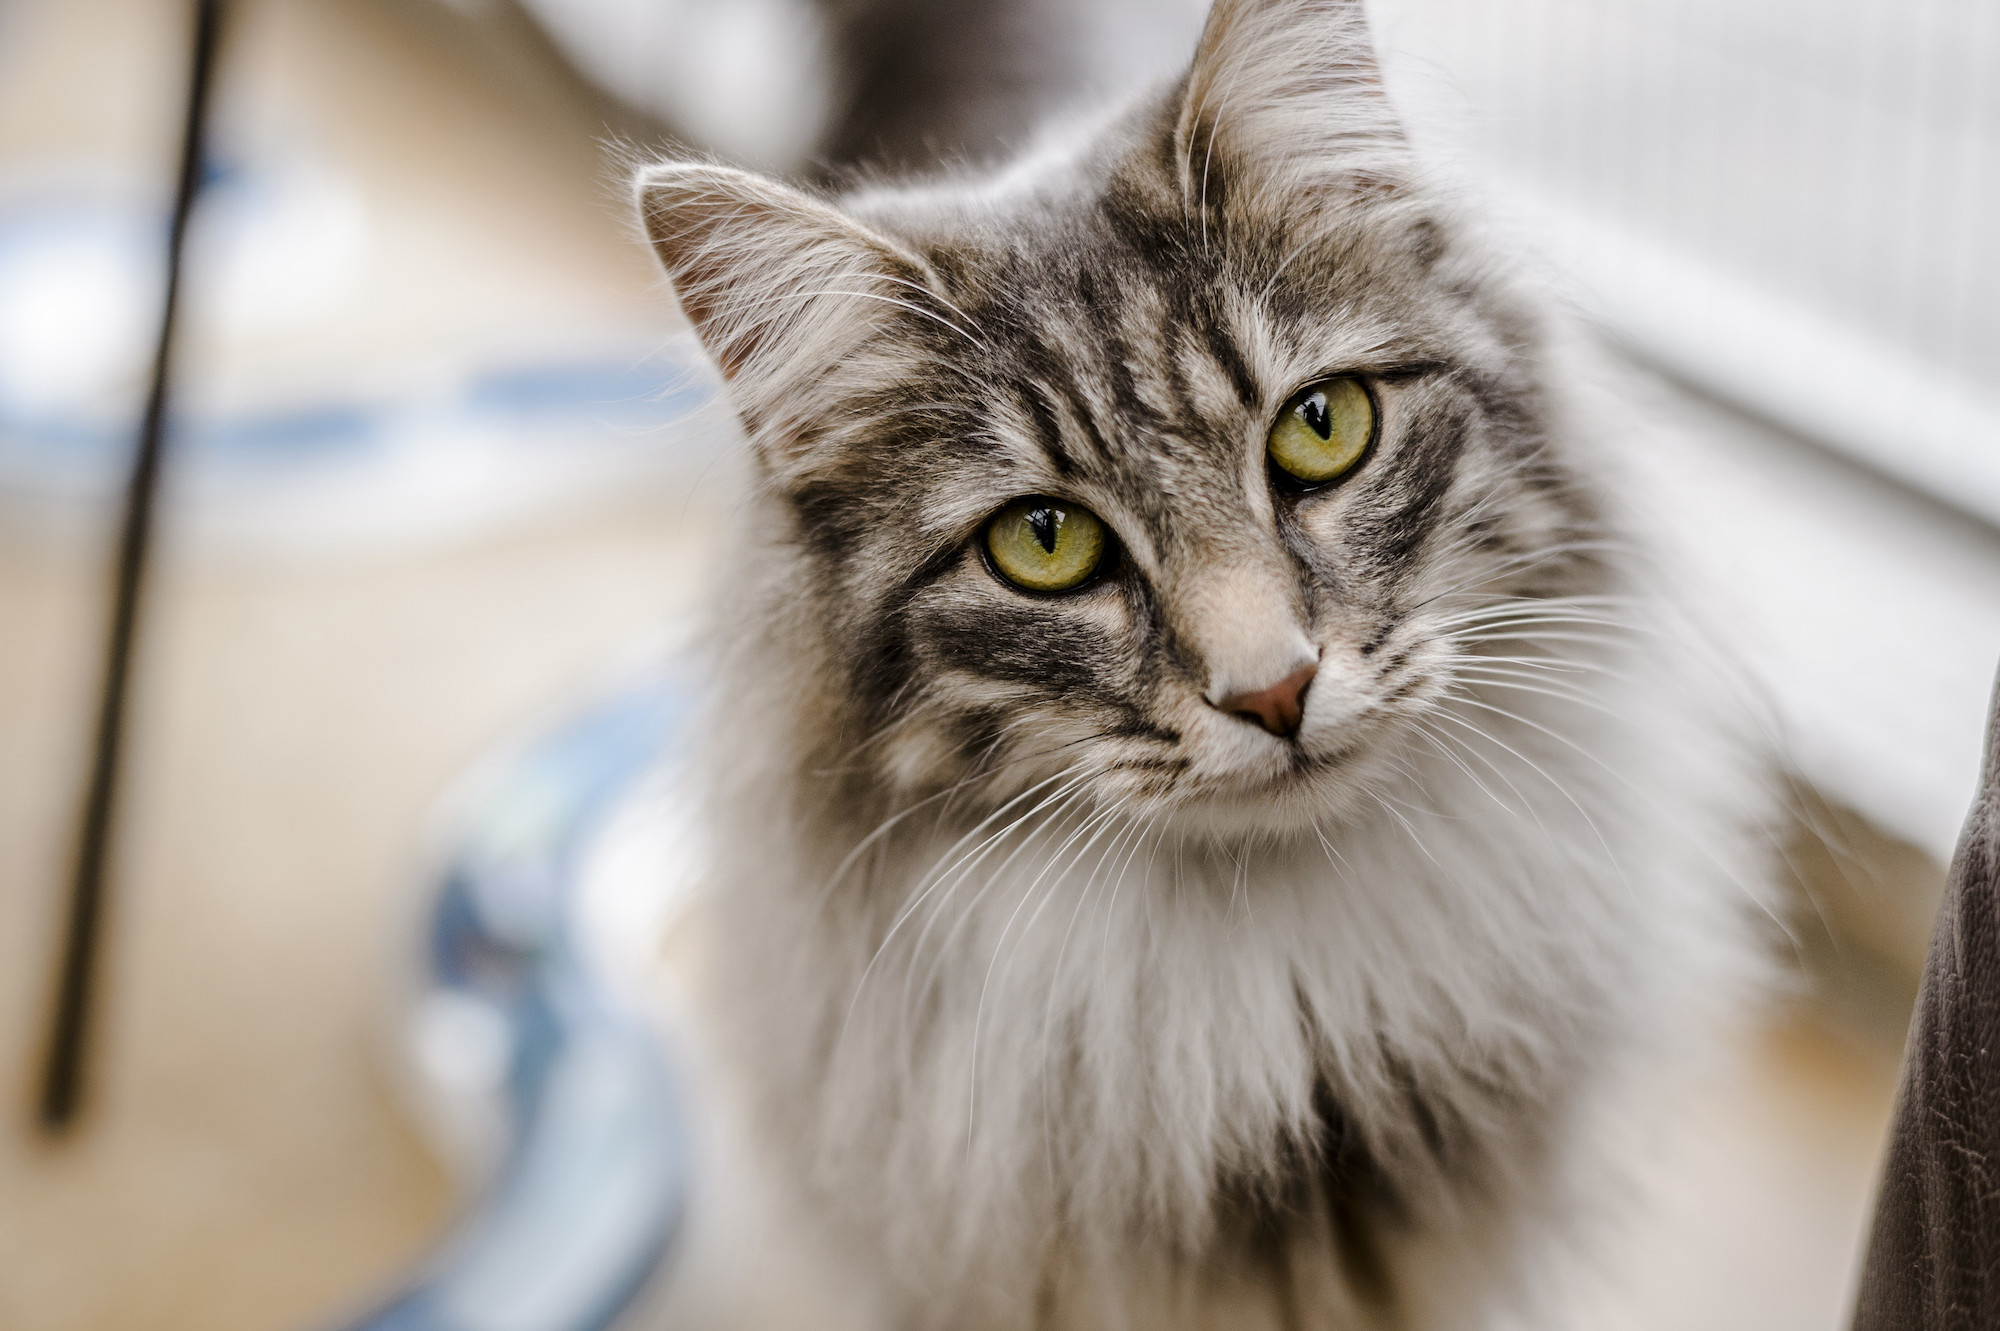 Read Carefully Before Choosing The Best Cat Litter For Your Lovely Cat